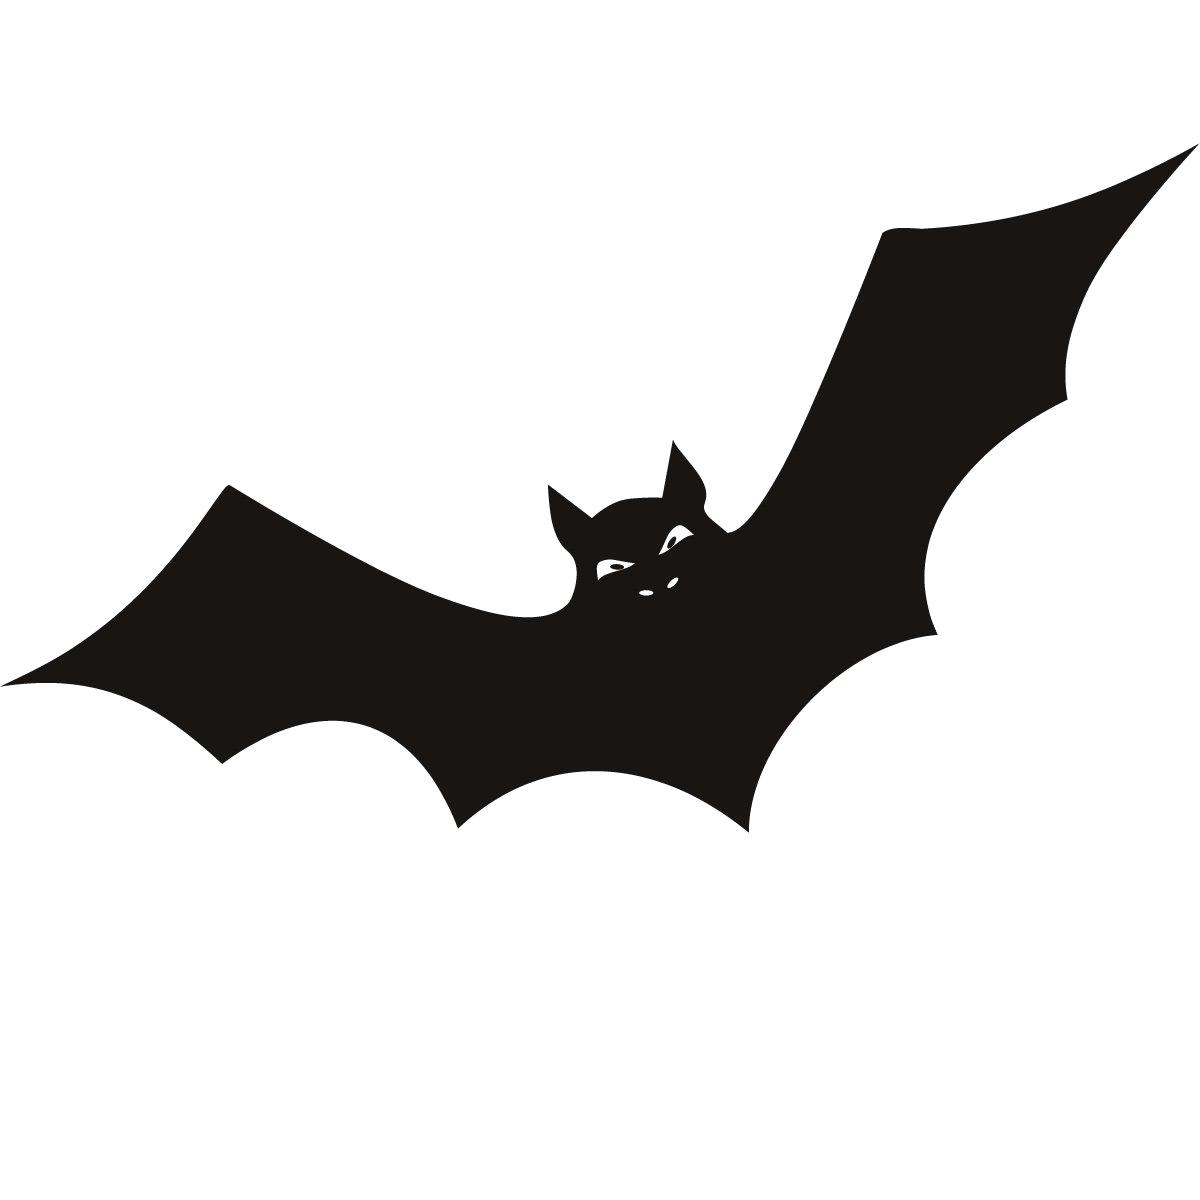 Scary pumpkin clipart black and white image freeuse stock Creepy Clipart Vampire Bat Free collection | Download and share ... image freeuse stock